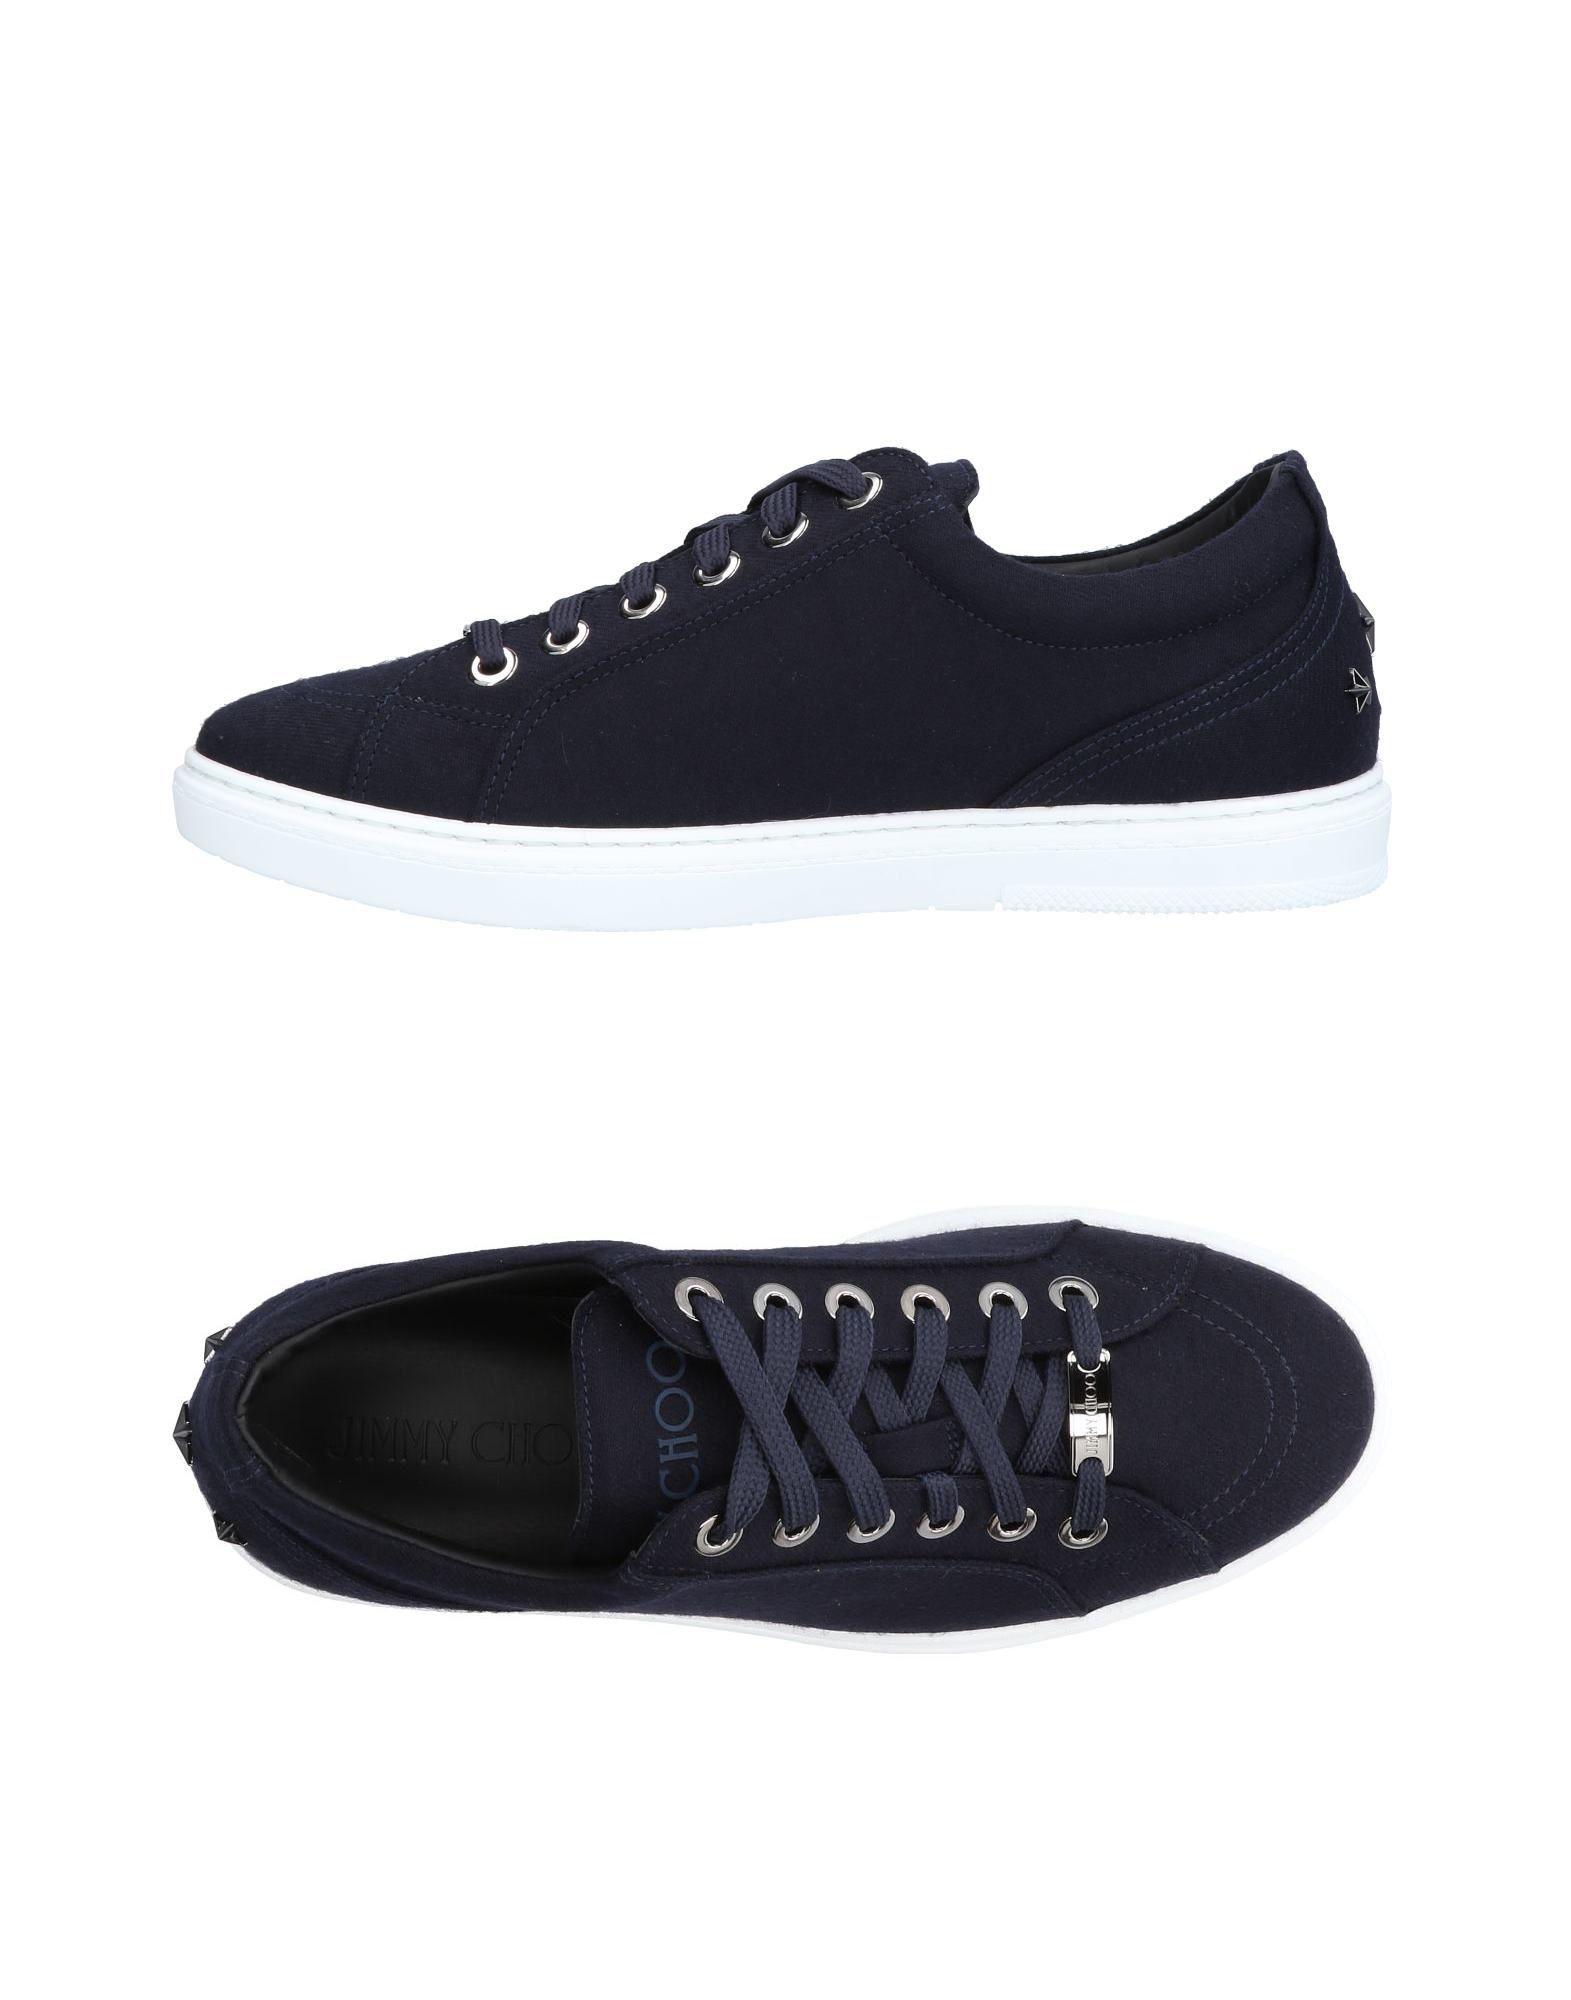 Jimmy Choo Sneakers Herren  11485876KI Gute Qualität beliebte Schuhe